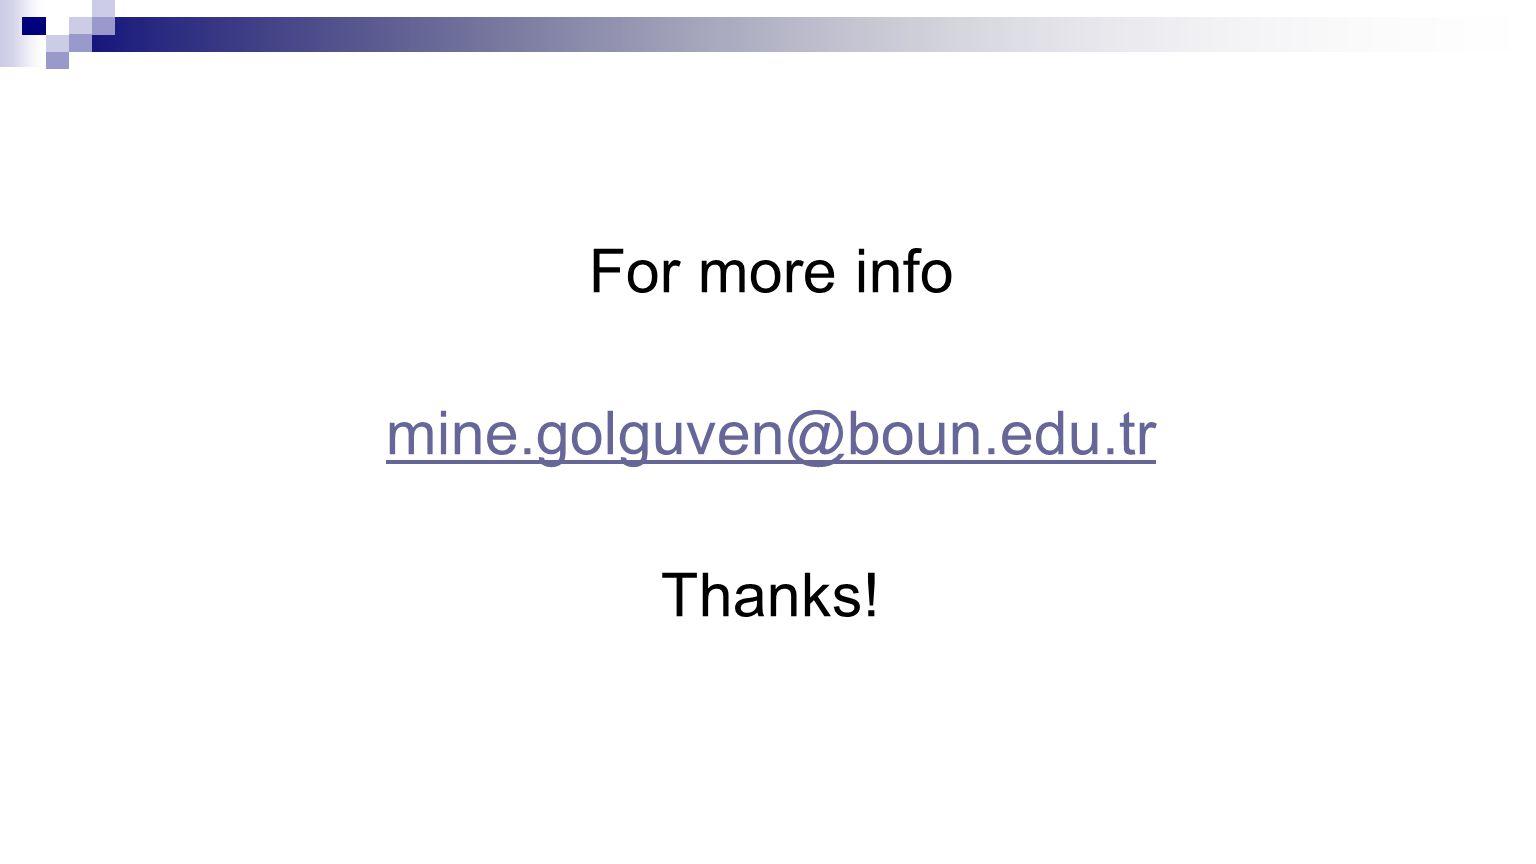 For more info mine.golguven@boun.edu.tr Thanks!